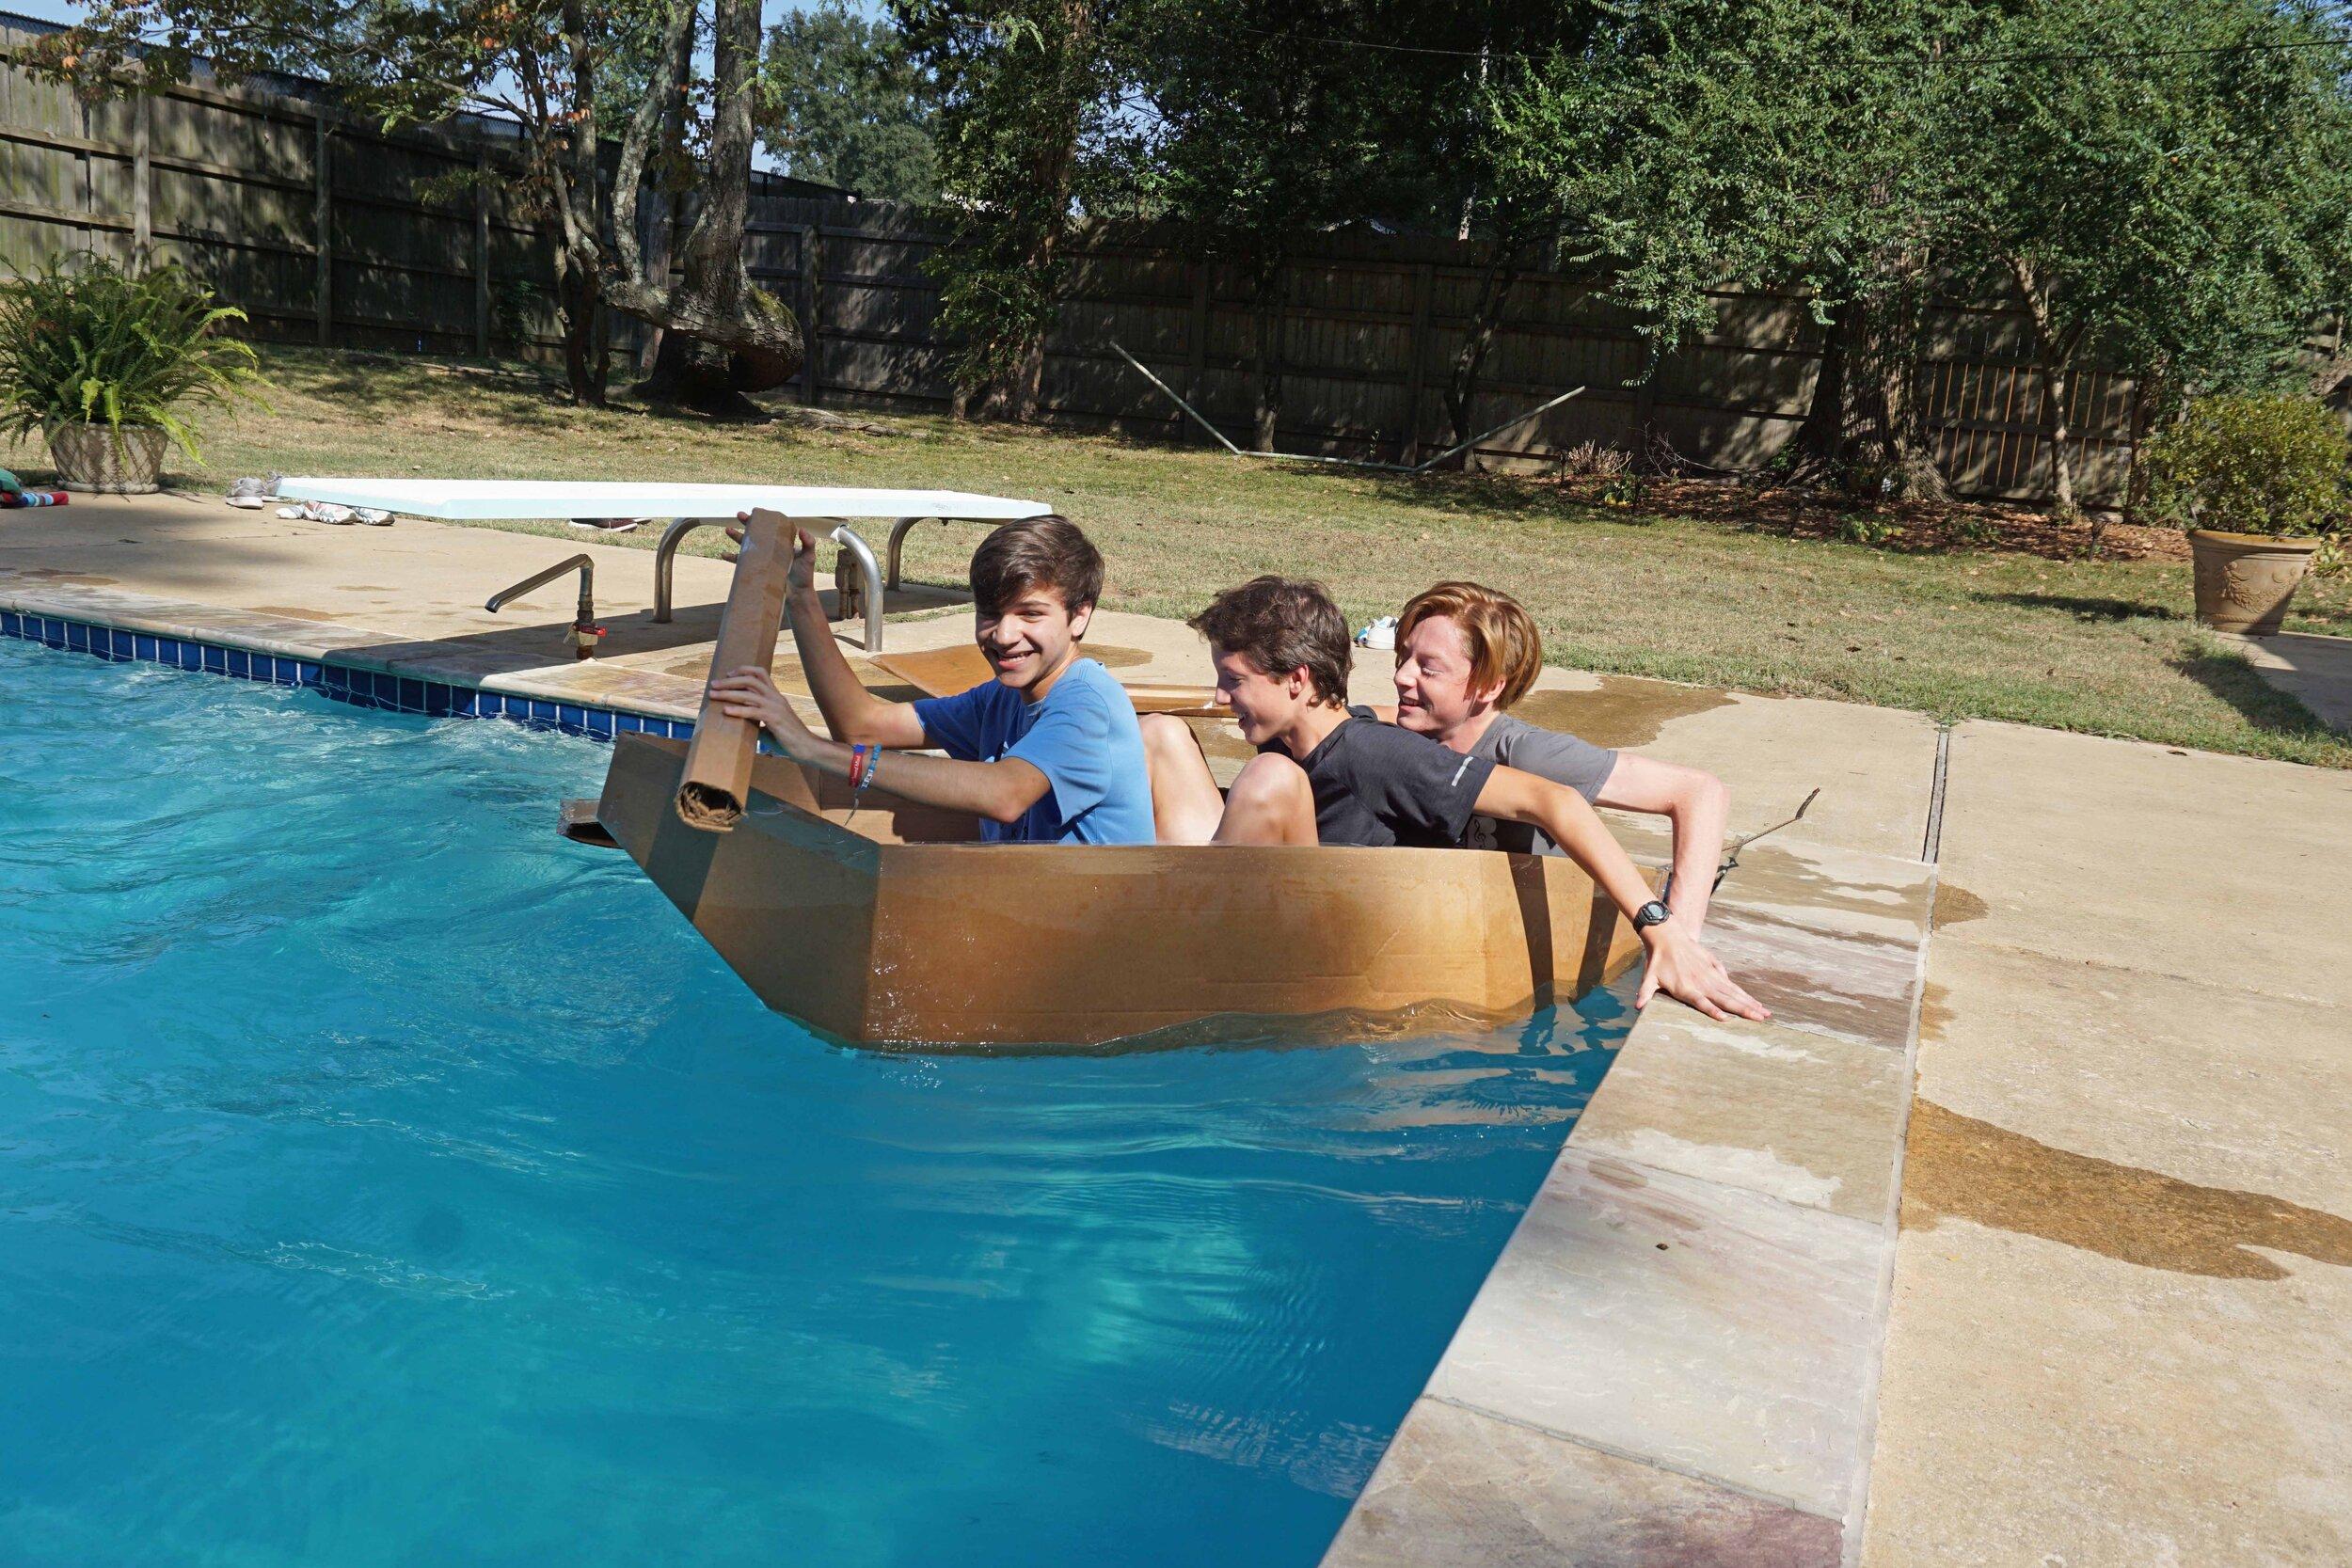 Sept27 DoCardboardBoatsFloat68.jpg